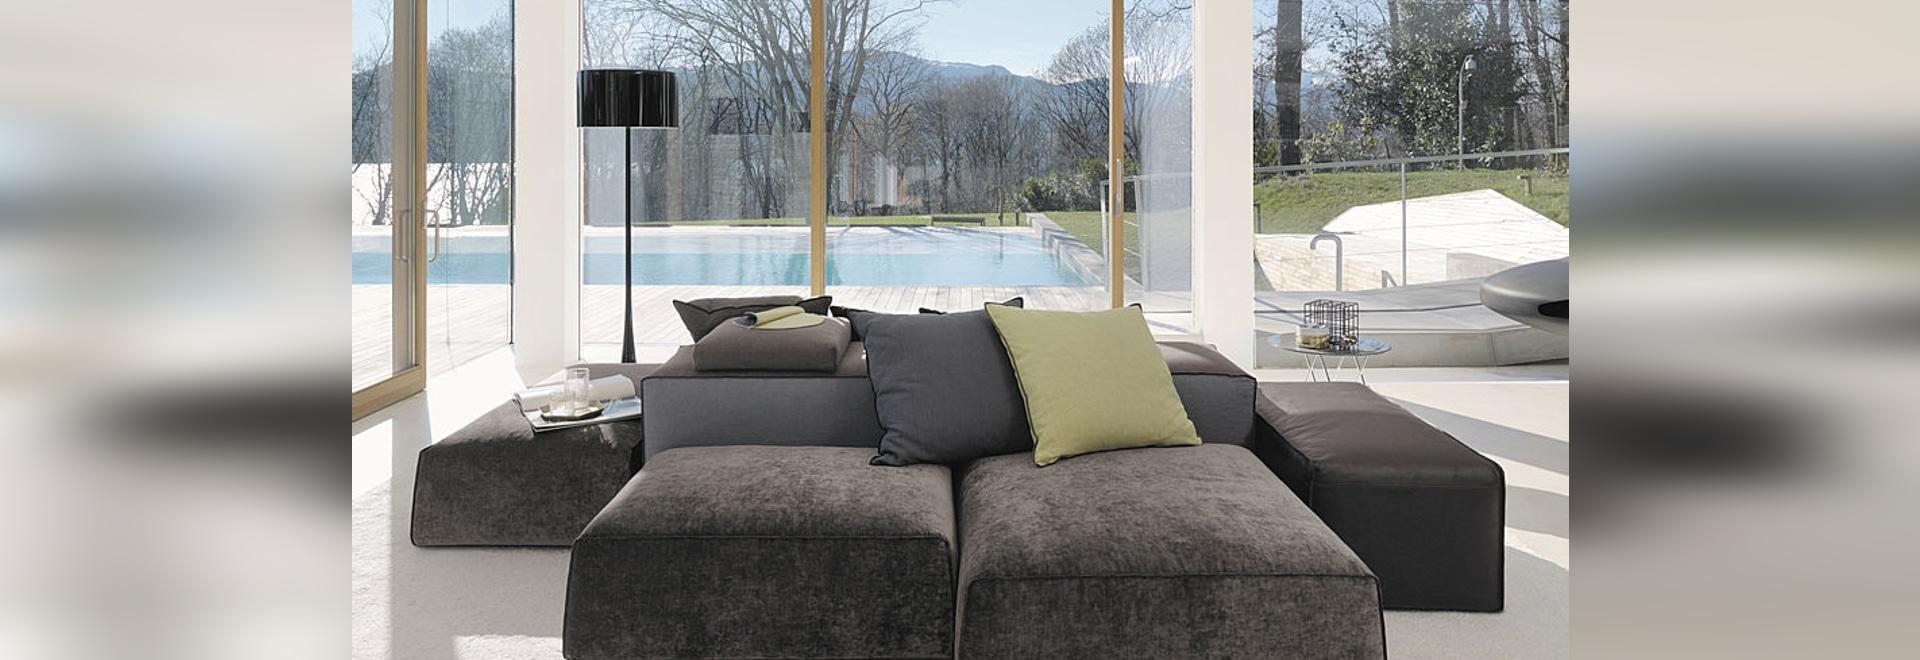 NEU: modulierbares Sofa by désirée